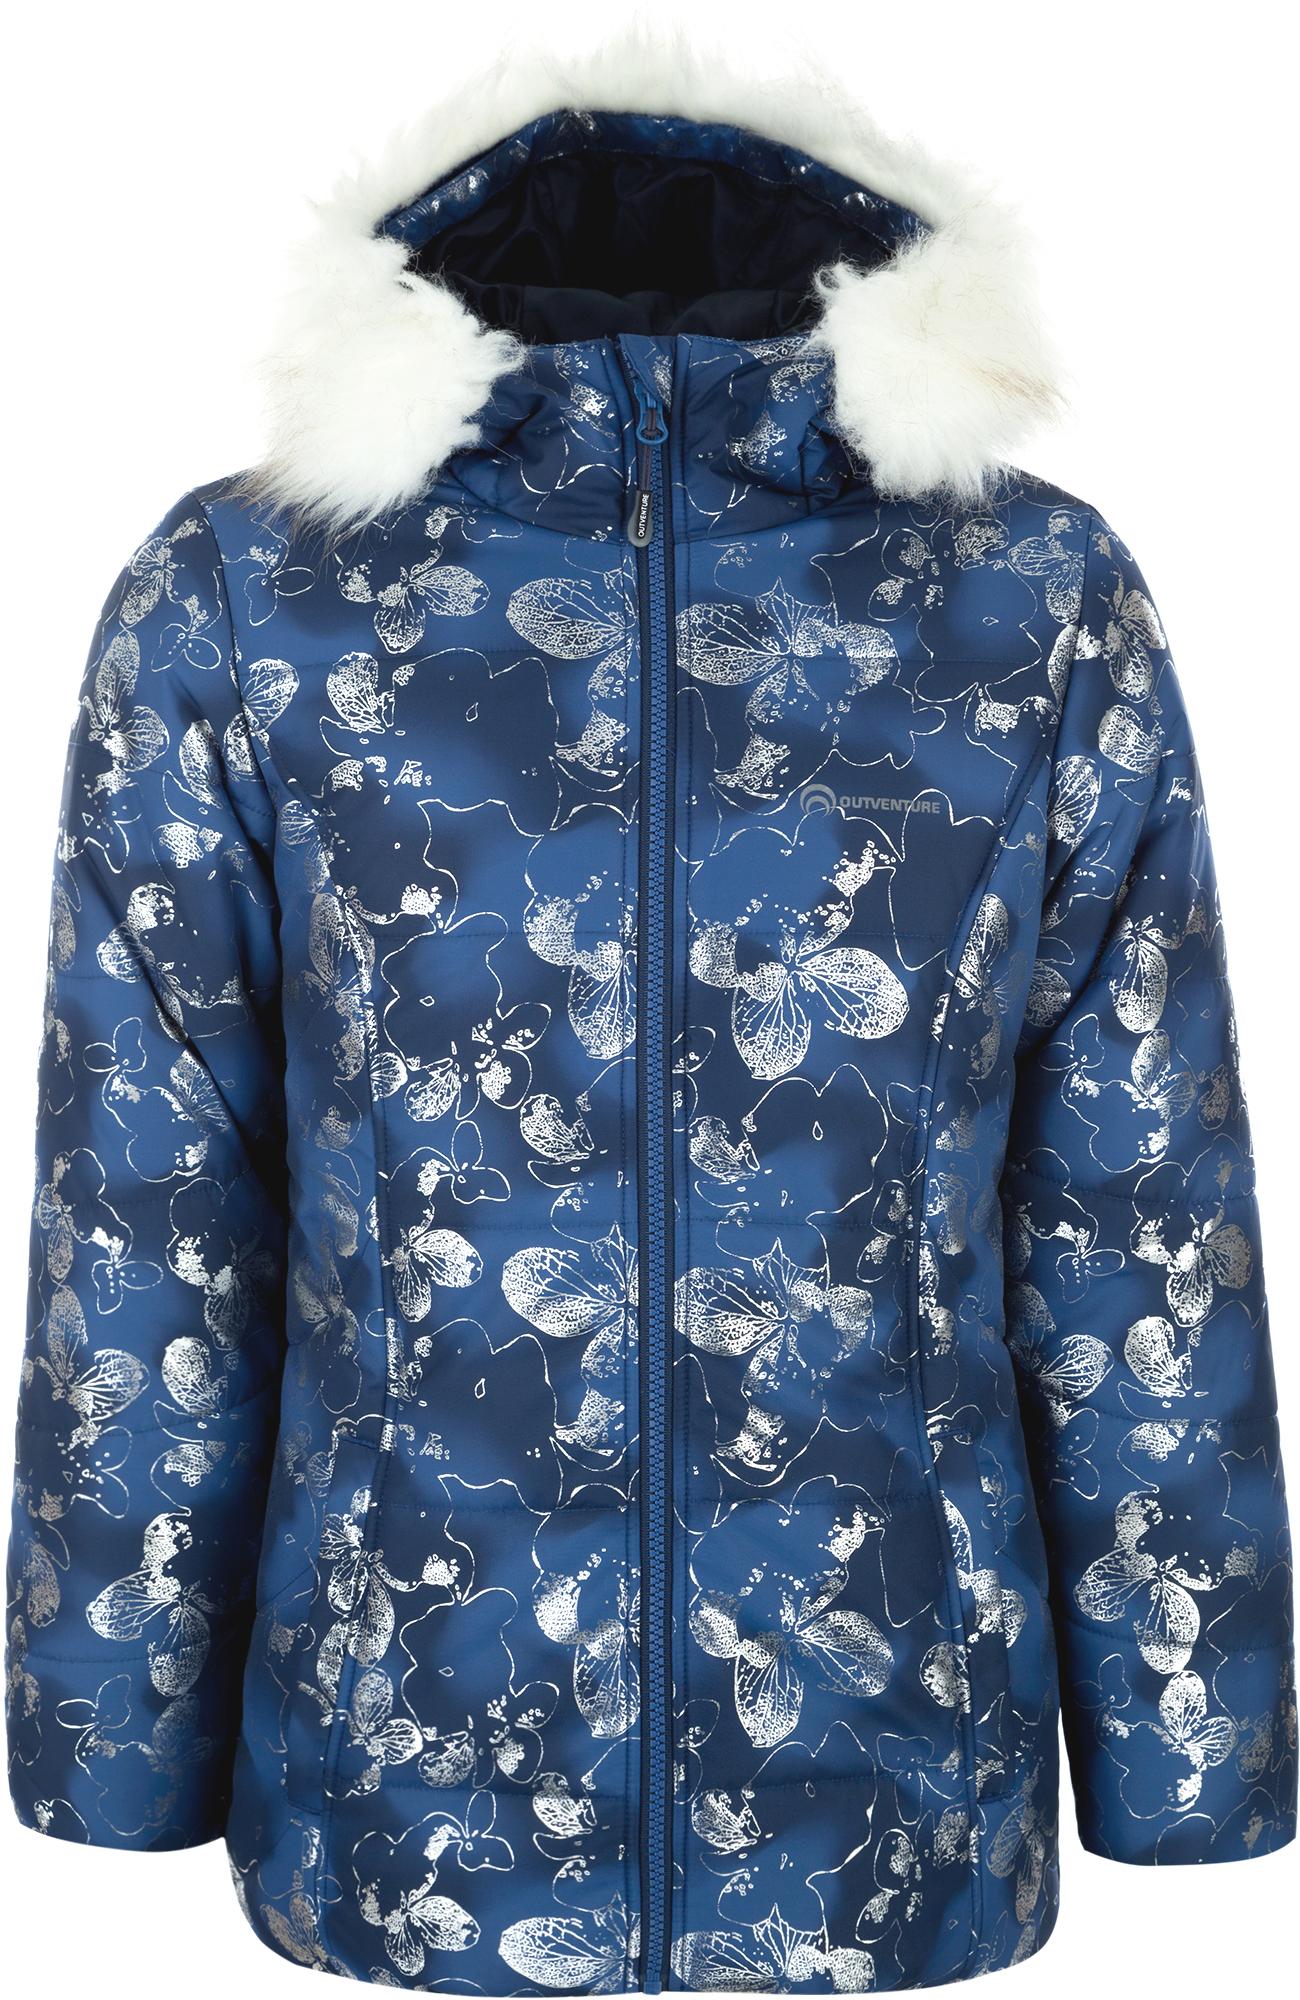 Outventure Куртка утепленная для девочек Outventure outventure куртка утепленная для девочек outventure